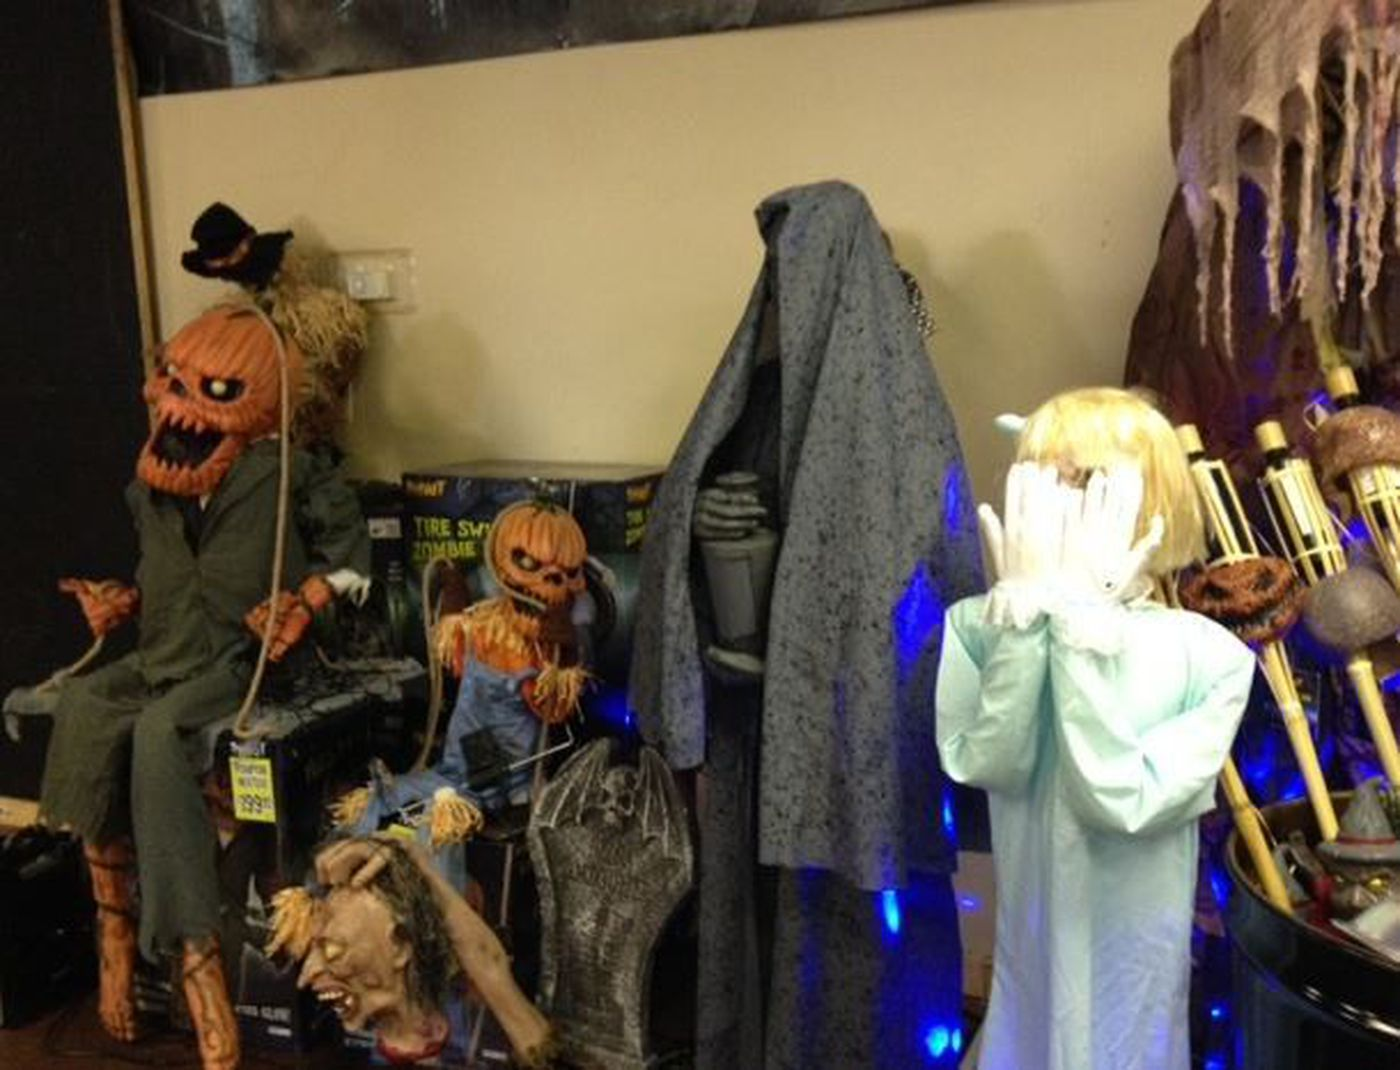 animatronics at spirit halloween store image source wlox news